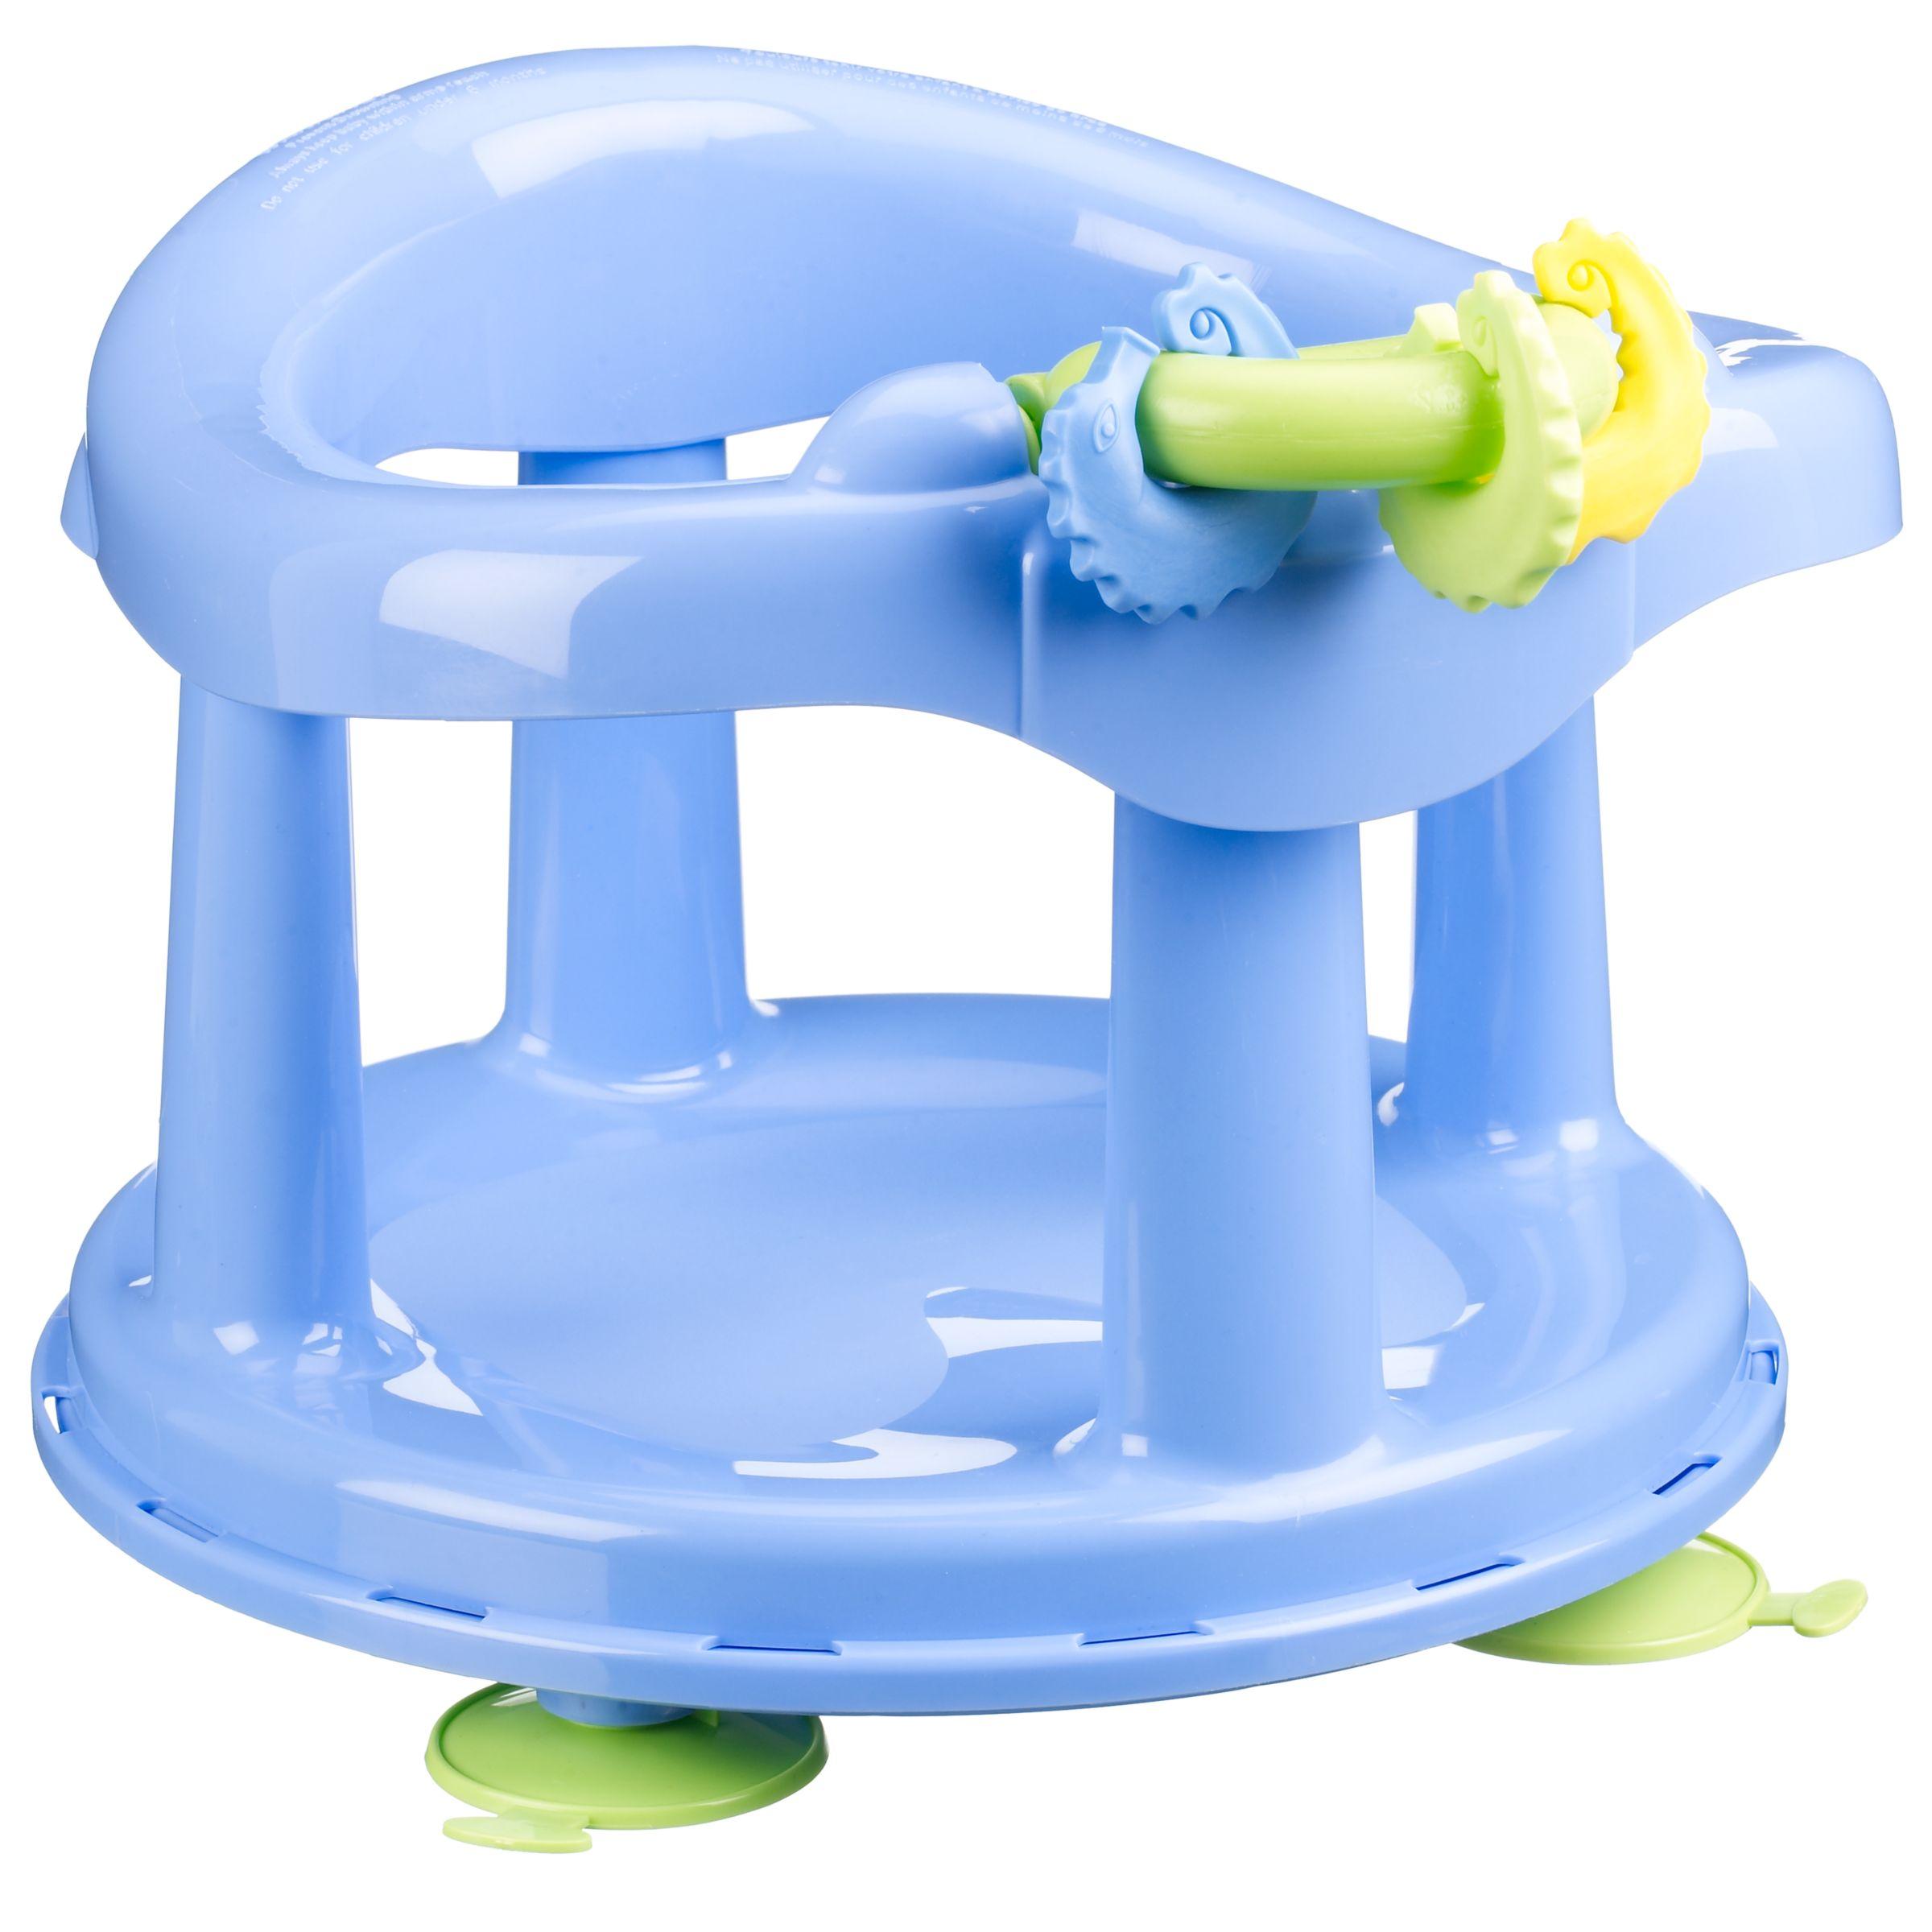 Safety 1st Bath Tub Ring Seat - home decor - Mrsilva.us